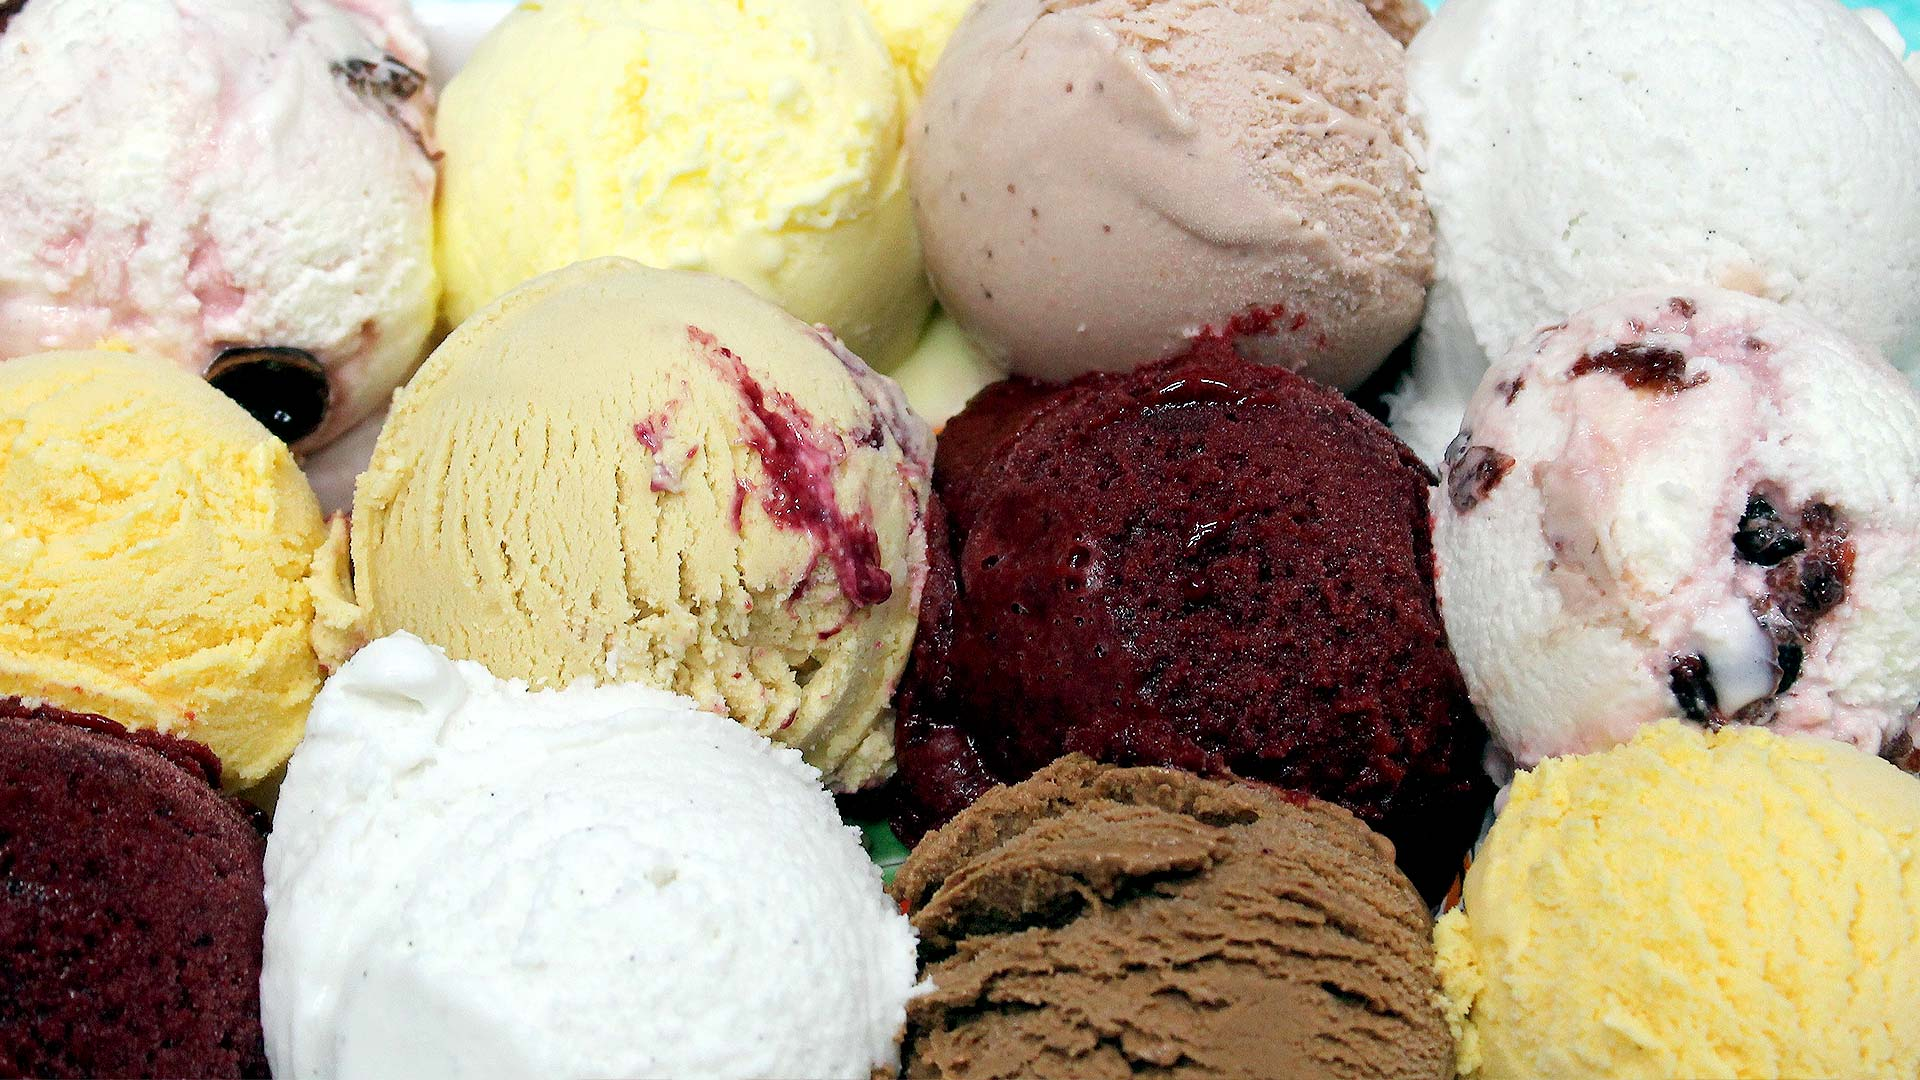 Nancy's Artisanal Creamery